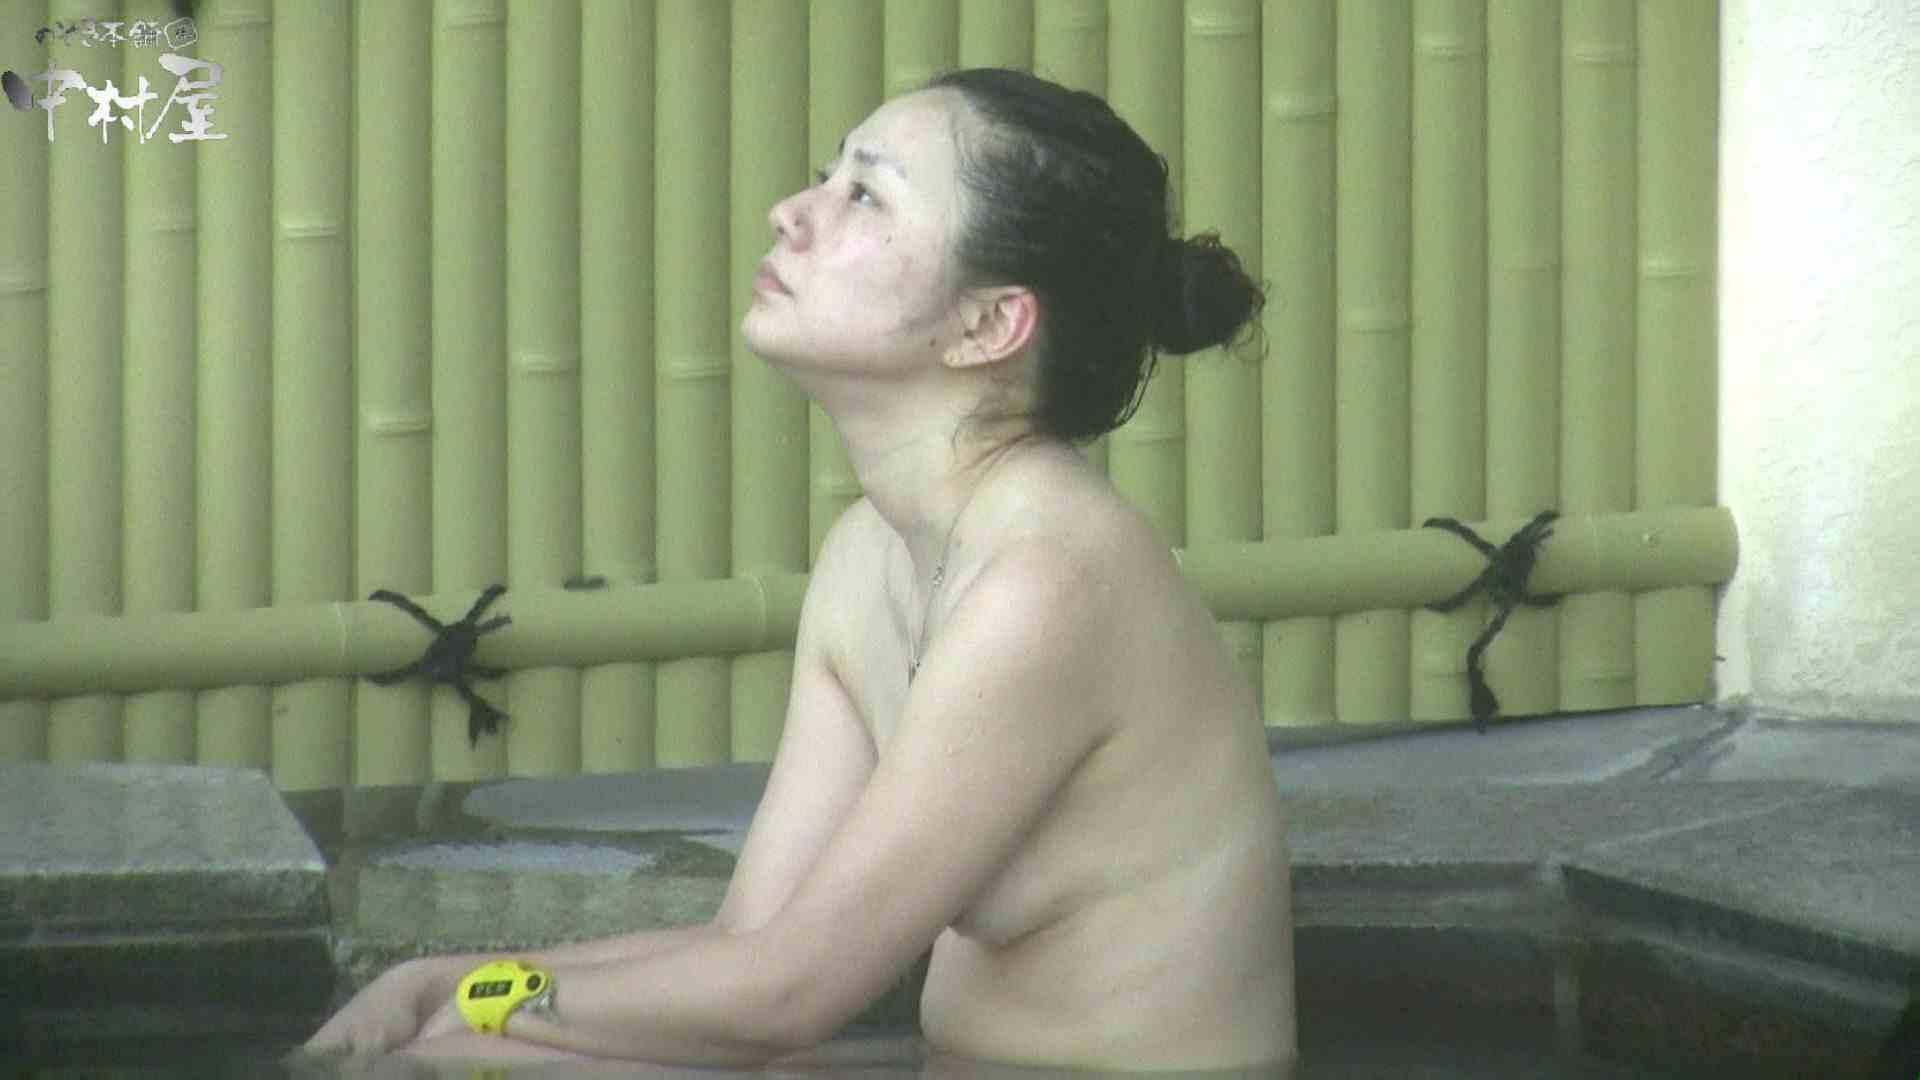 Aquaな露天風呂Vol.969 女体盗撮   OL女体  40連発 31